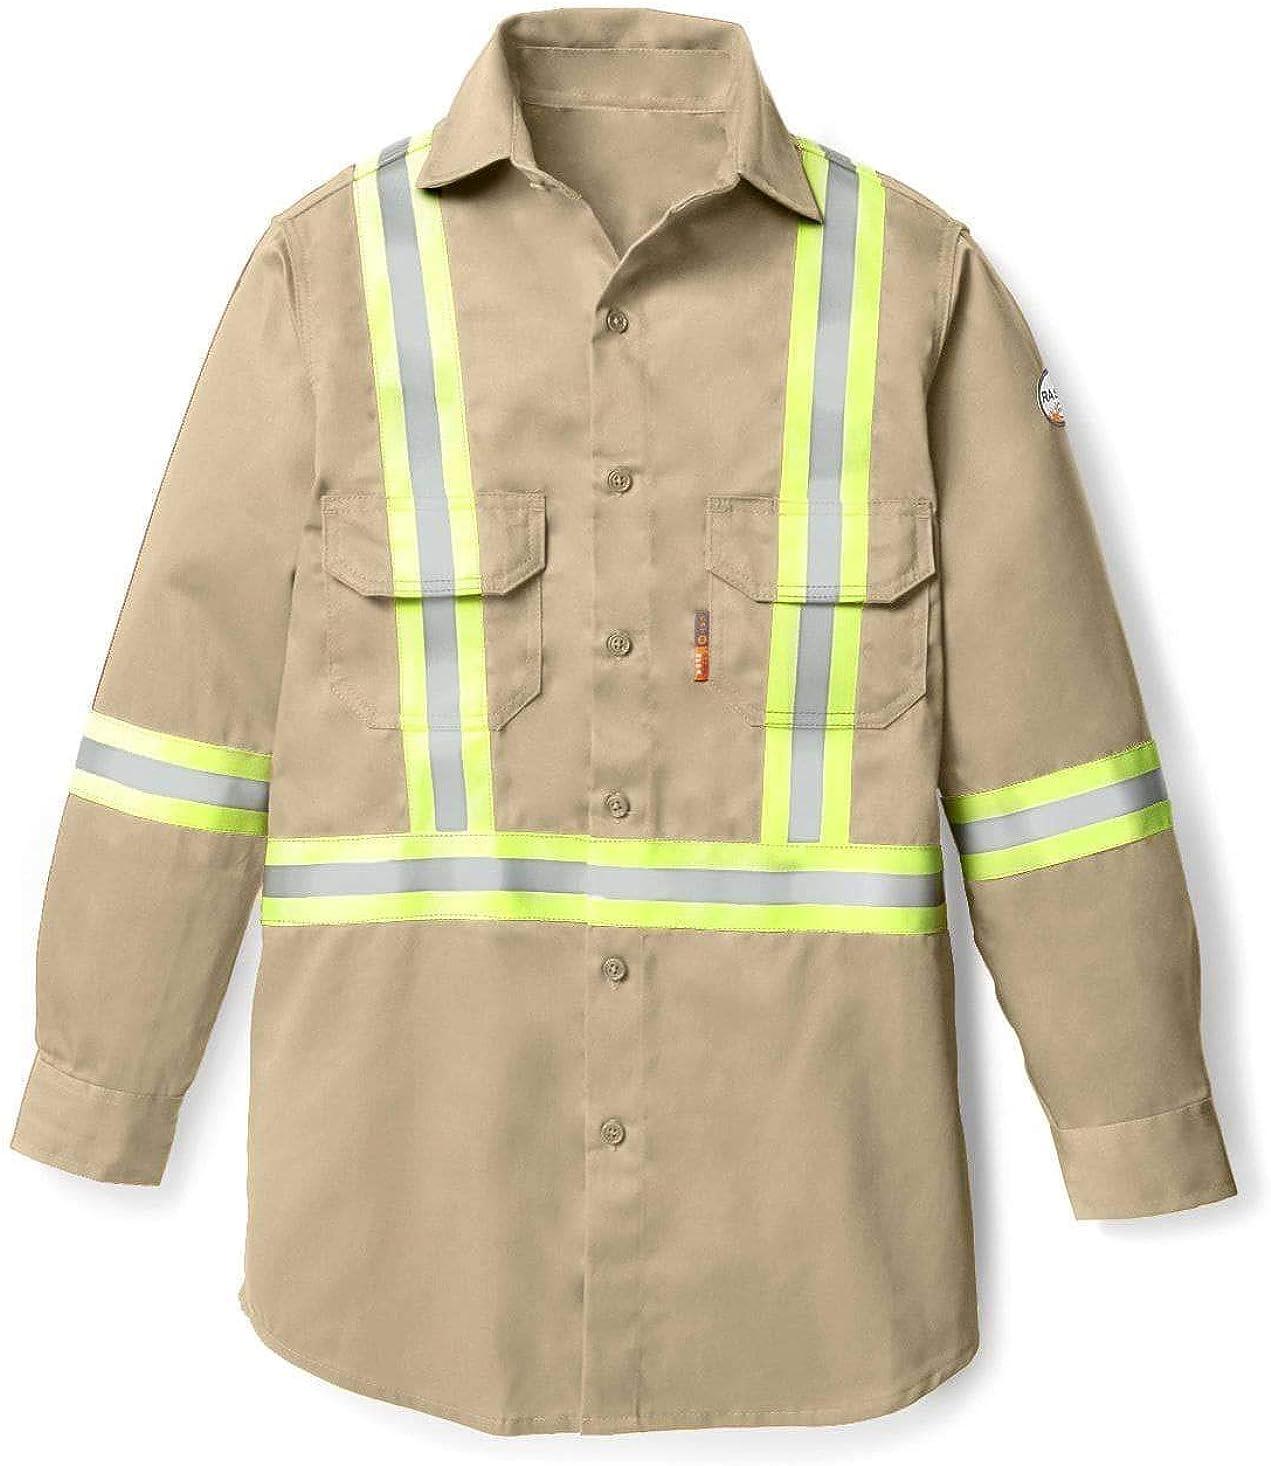 Rasco FR Men's Uniform Shirt with Reflective Trim